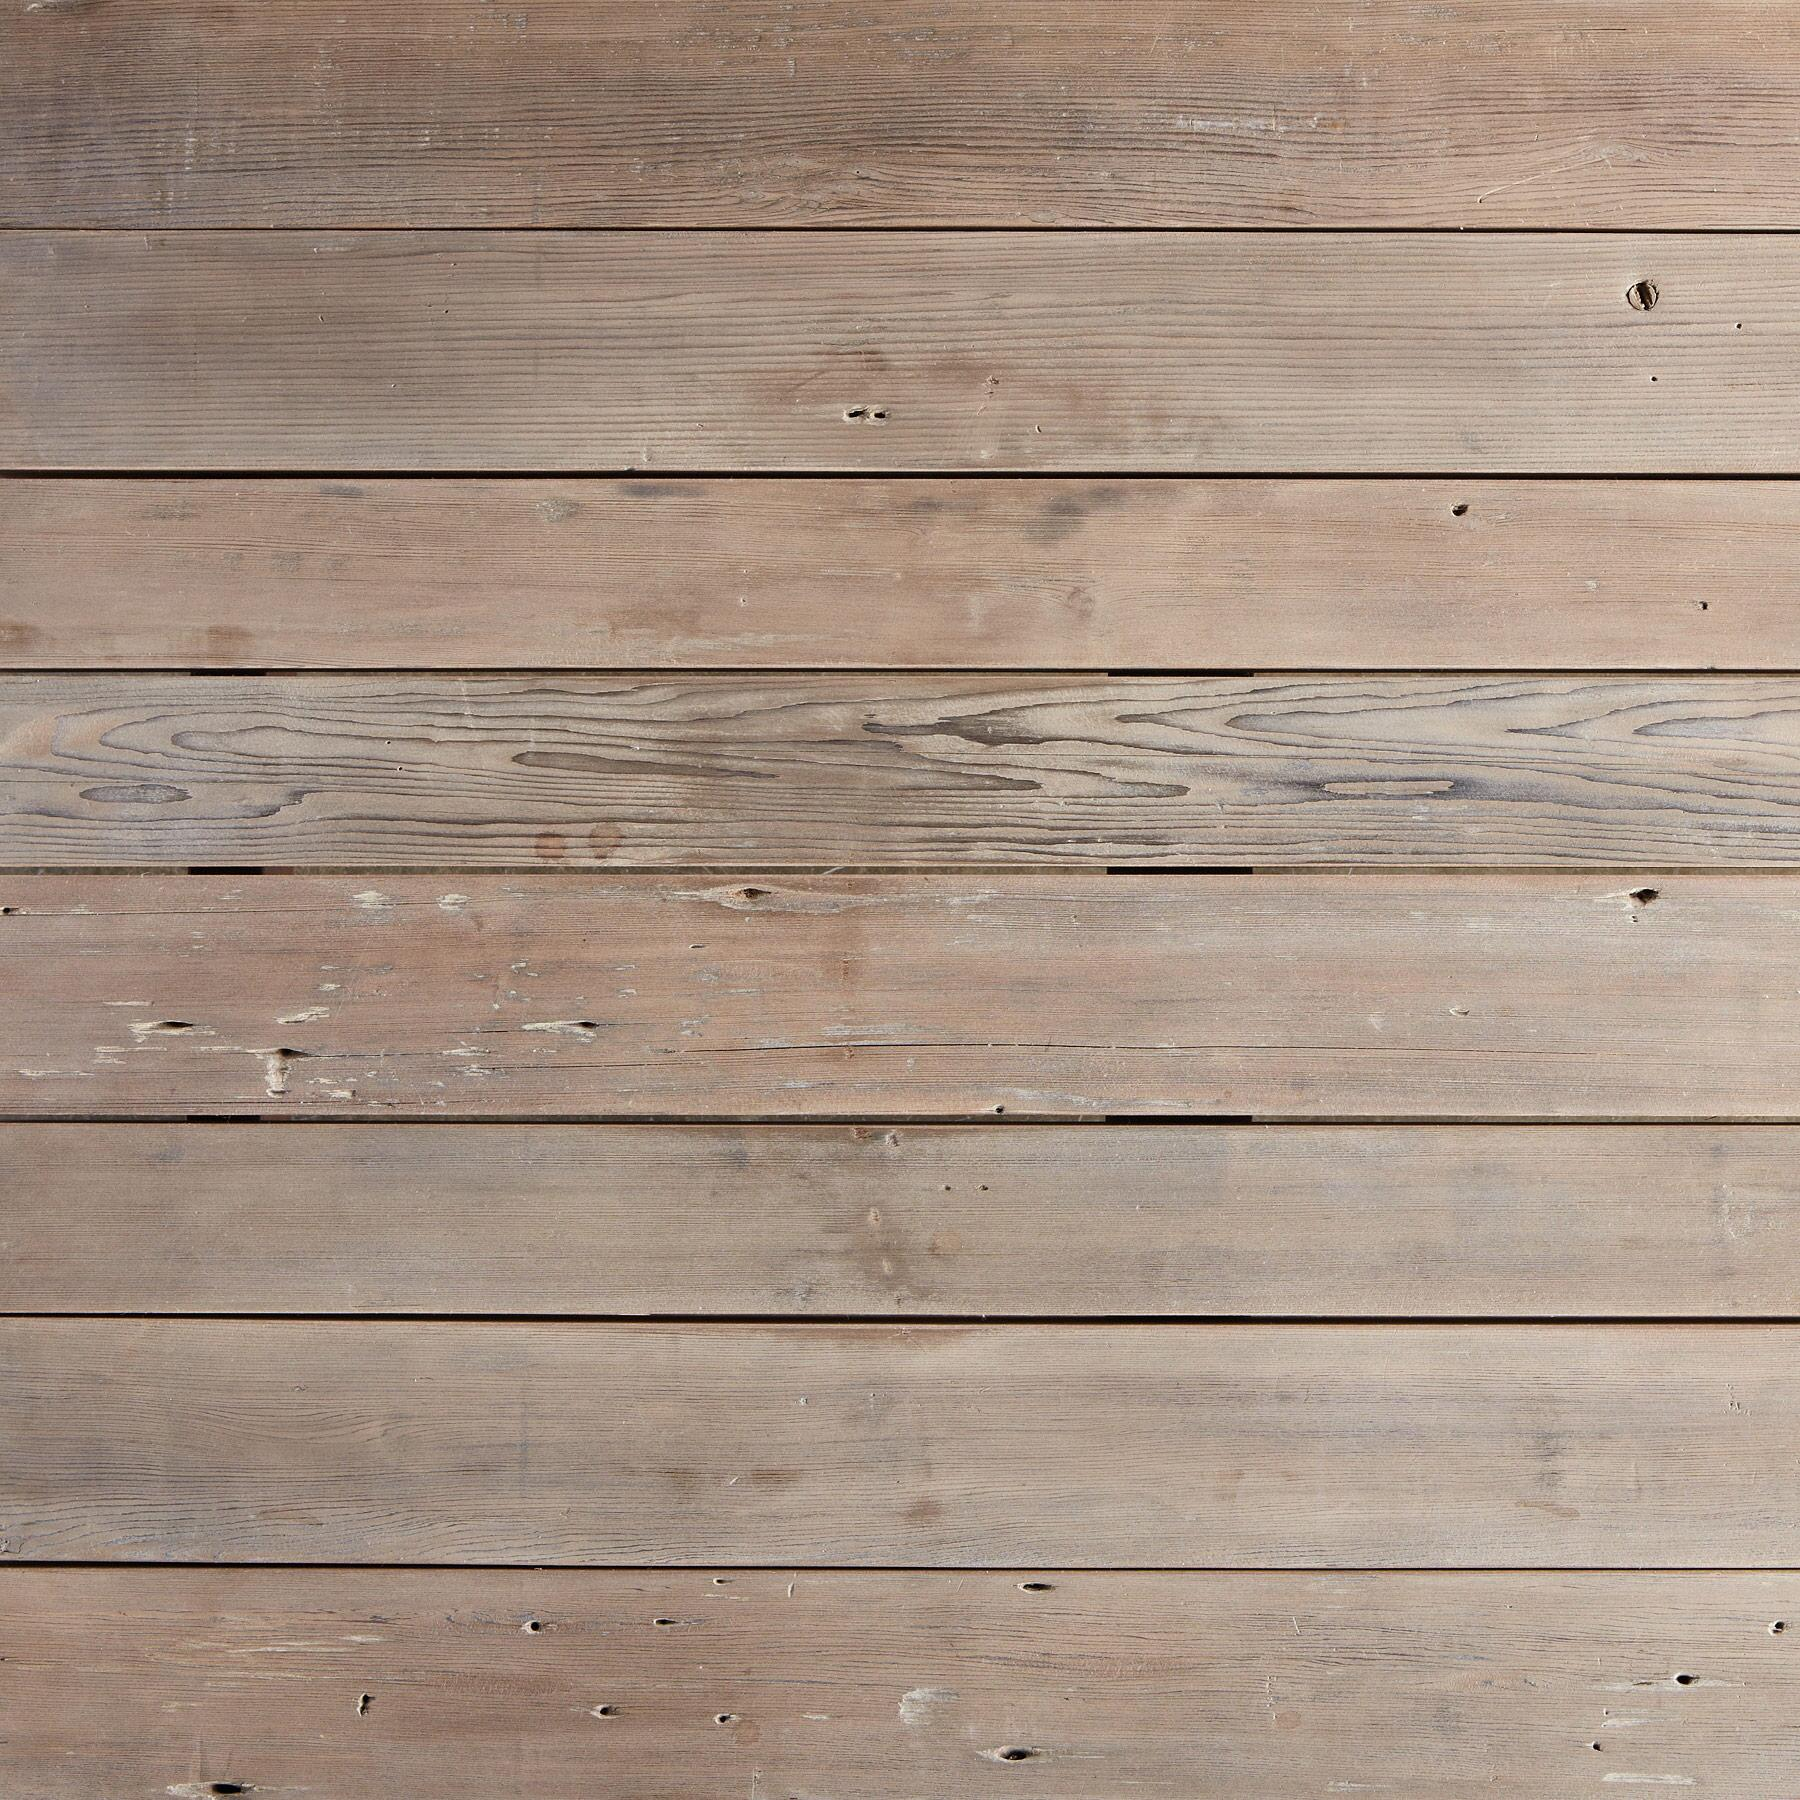 SALT & VINEGAR REDWOOD TABLE: View 3